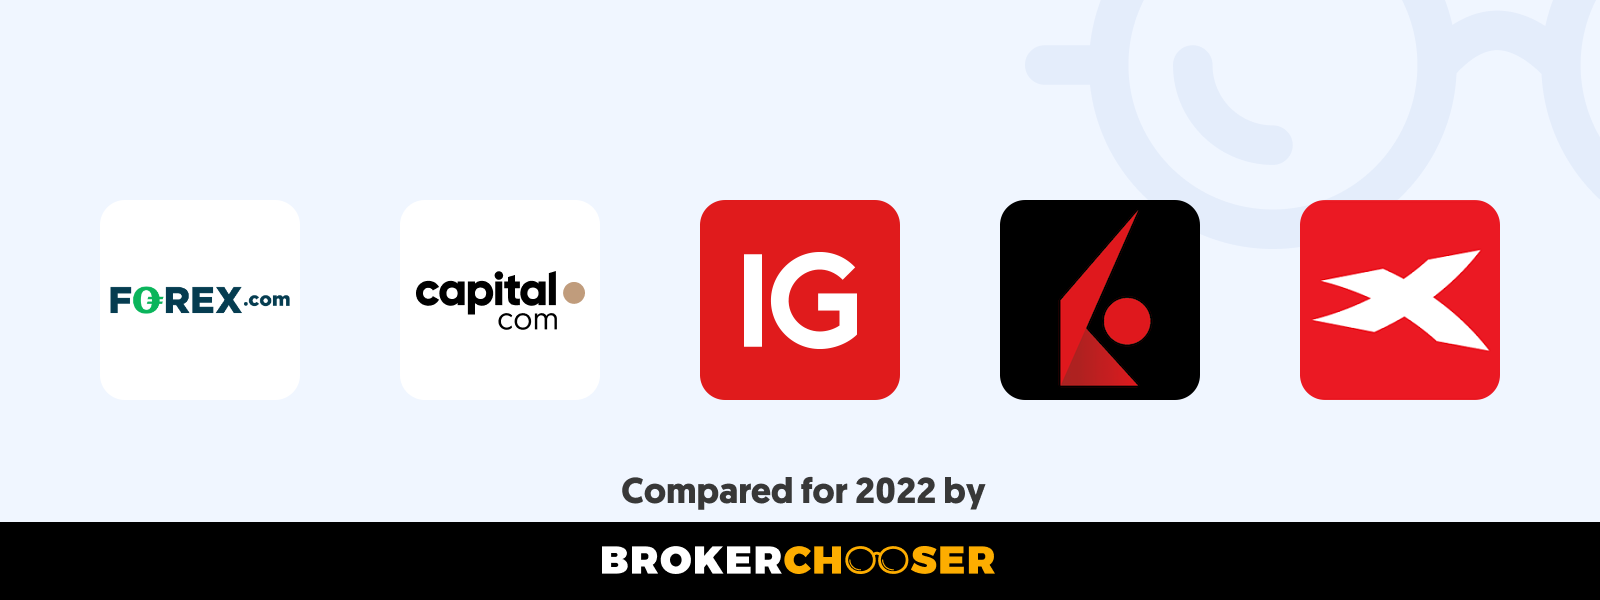 Best forex brokers for beginners in Swaziland in 2021